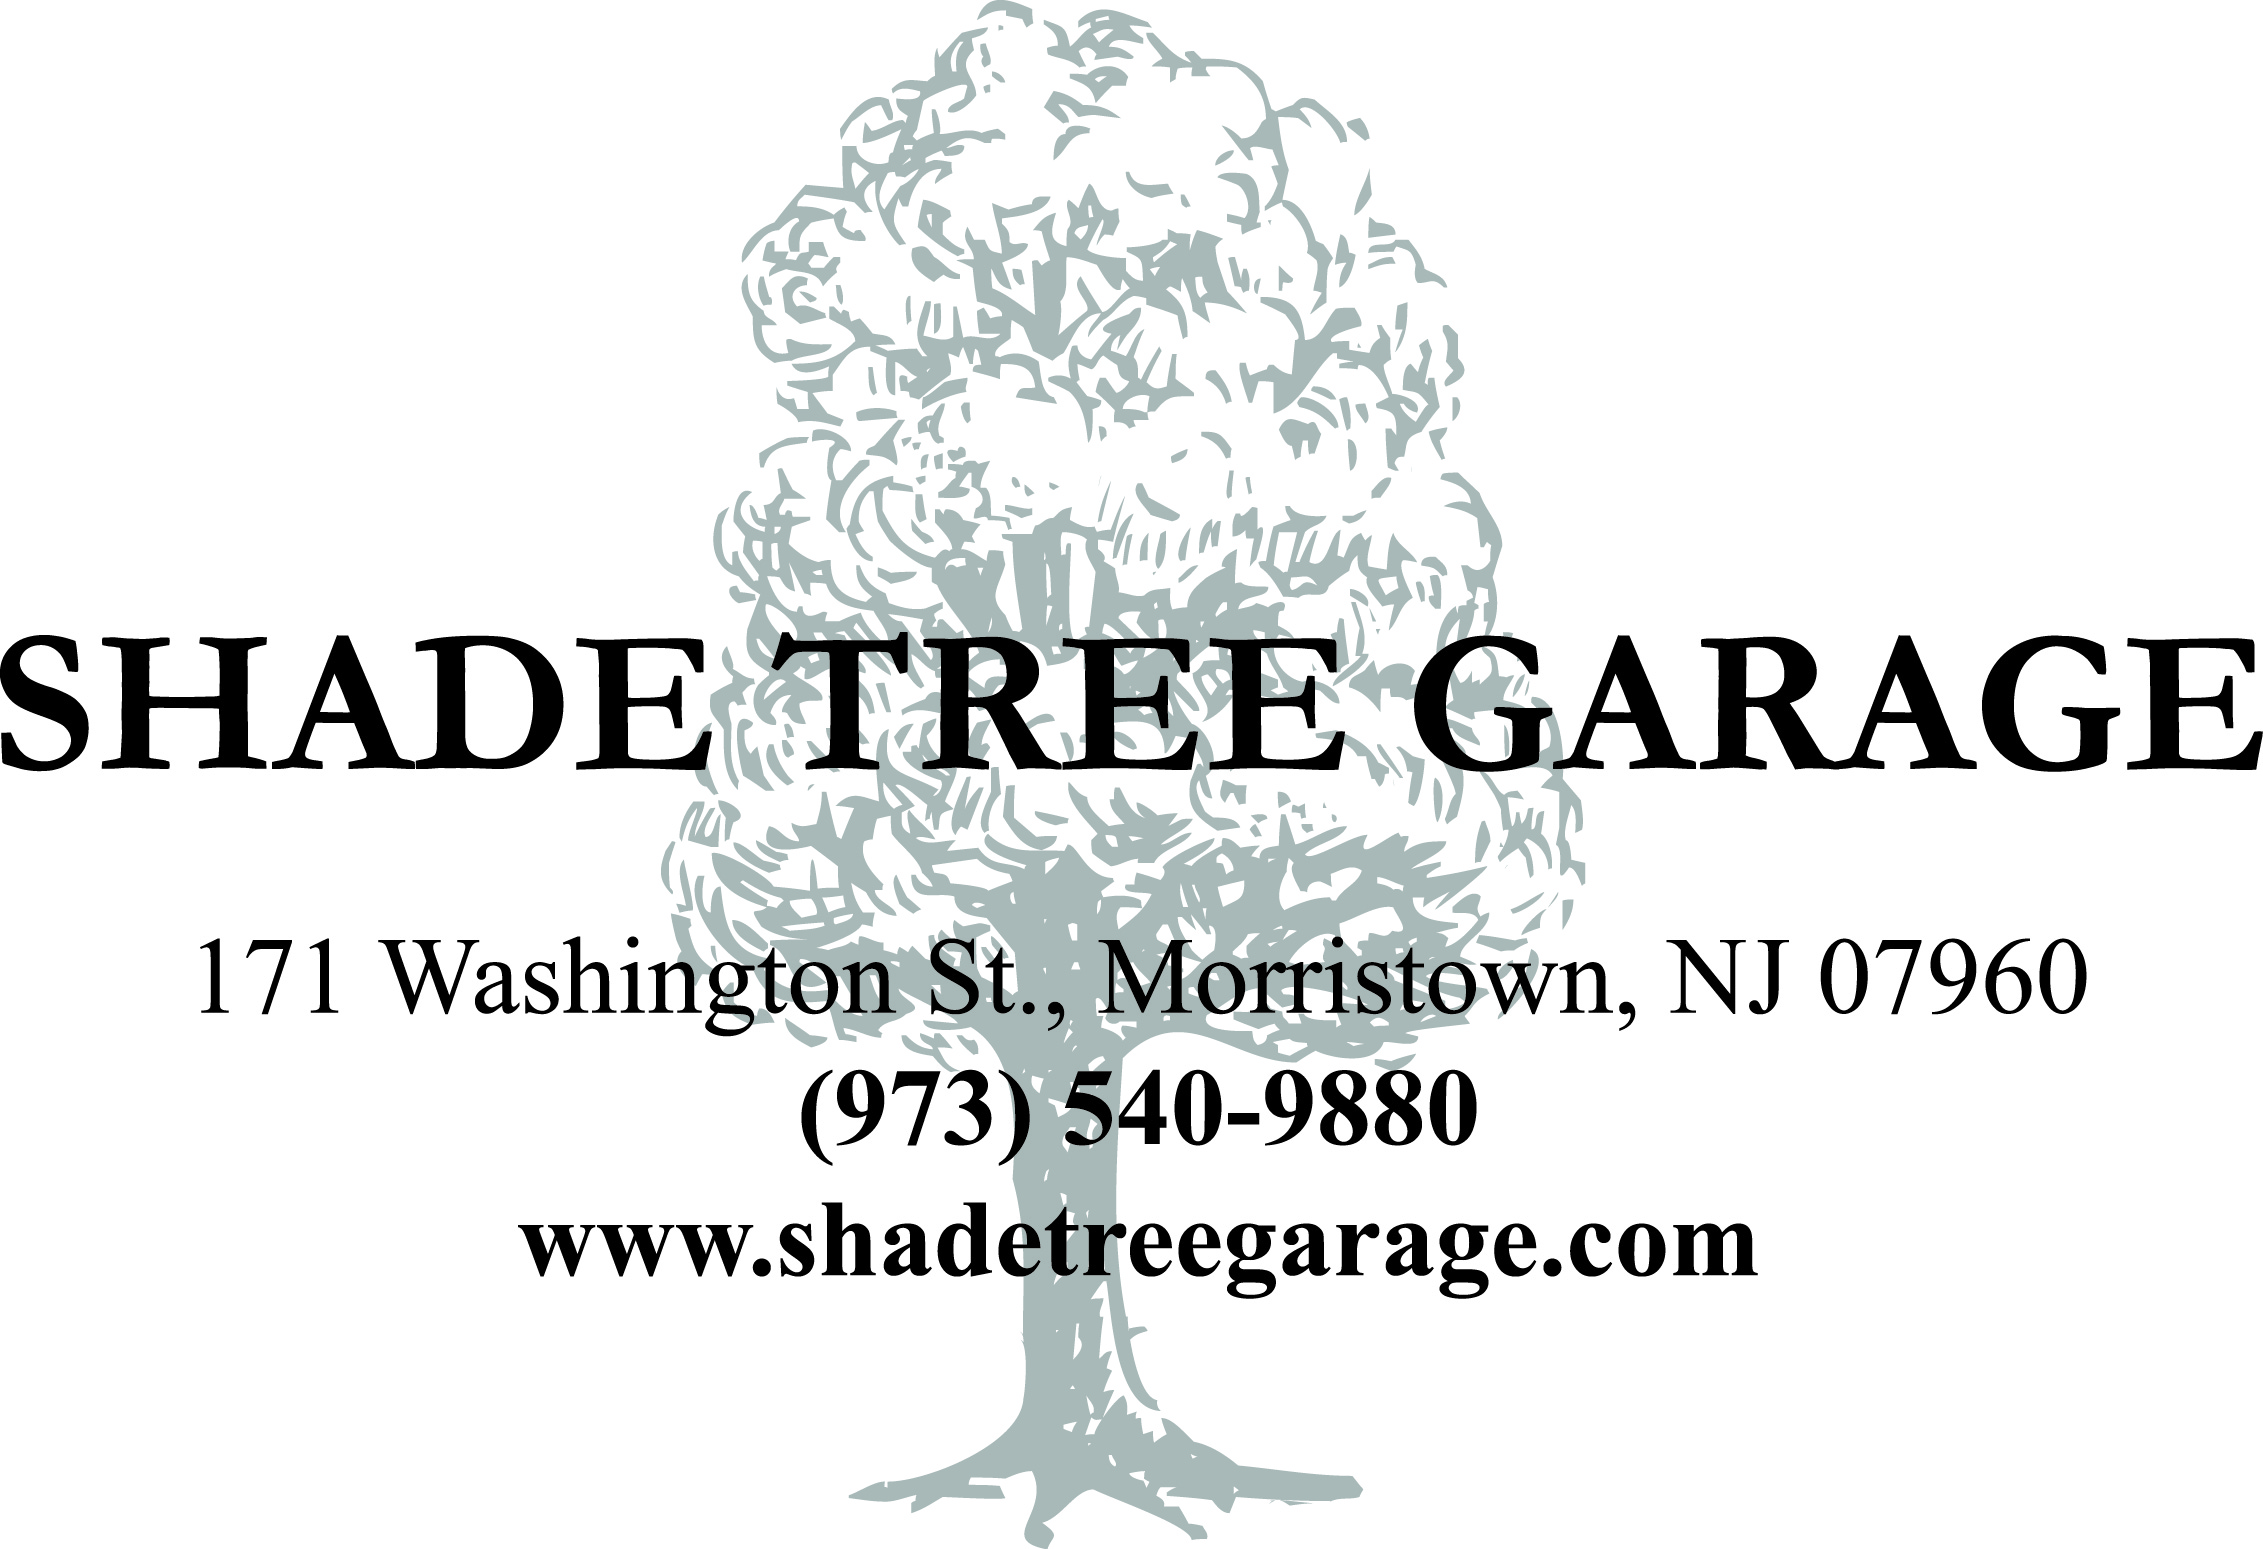 Shade Tree Garage